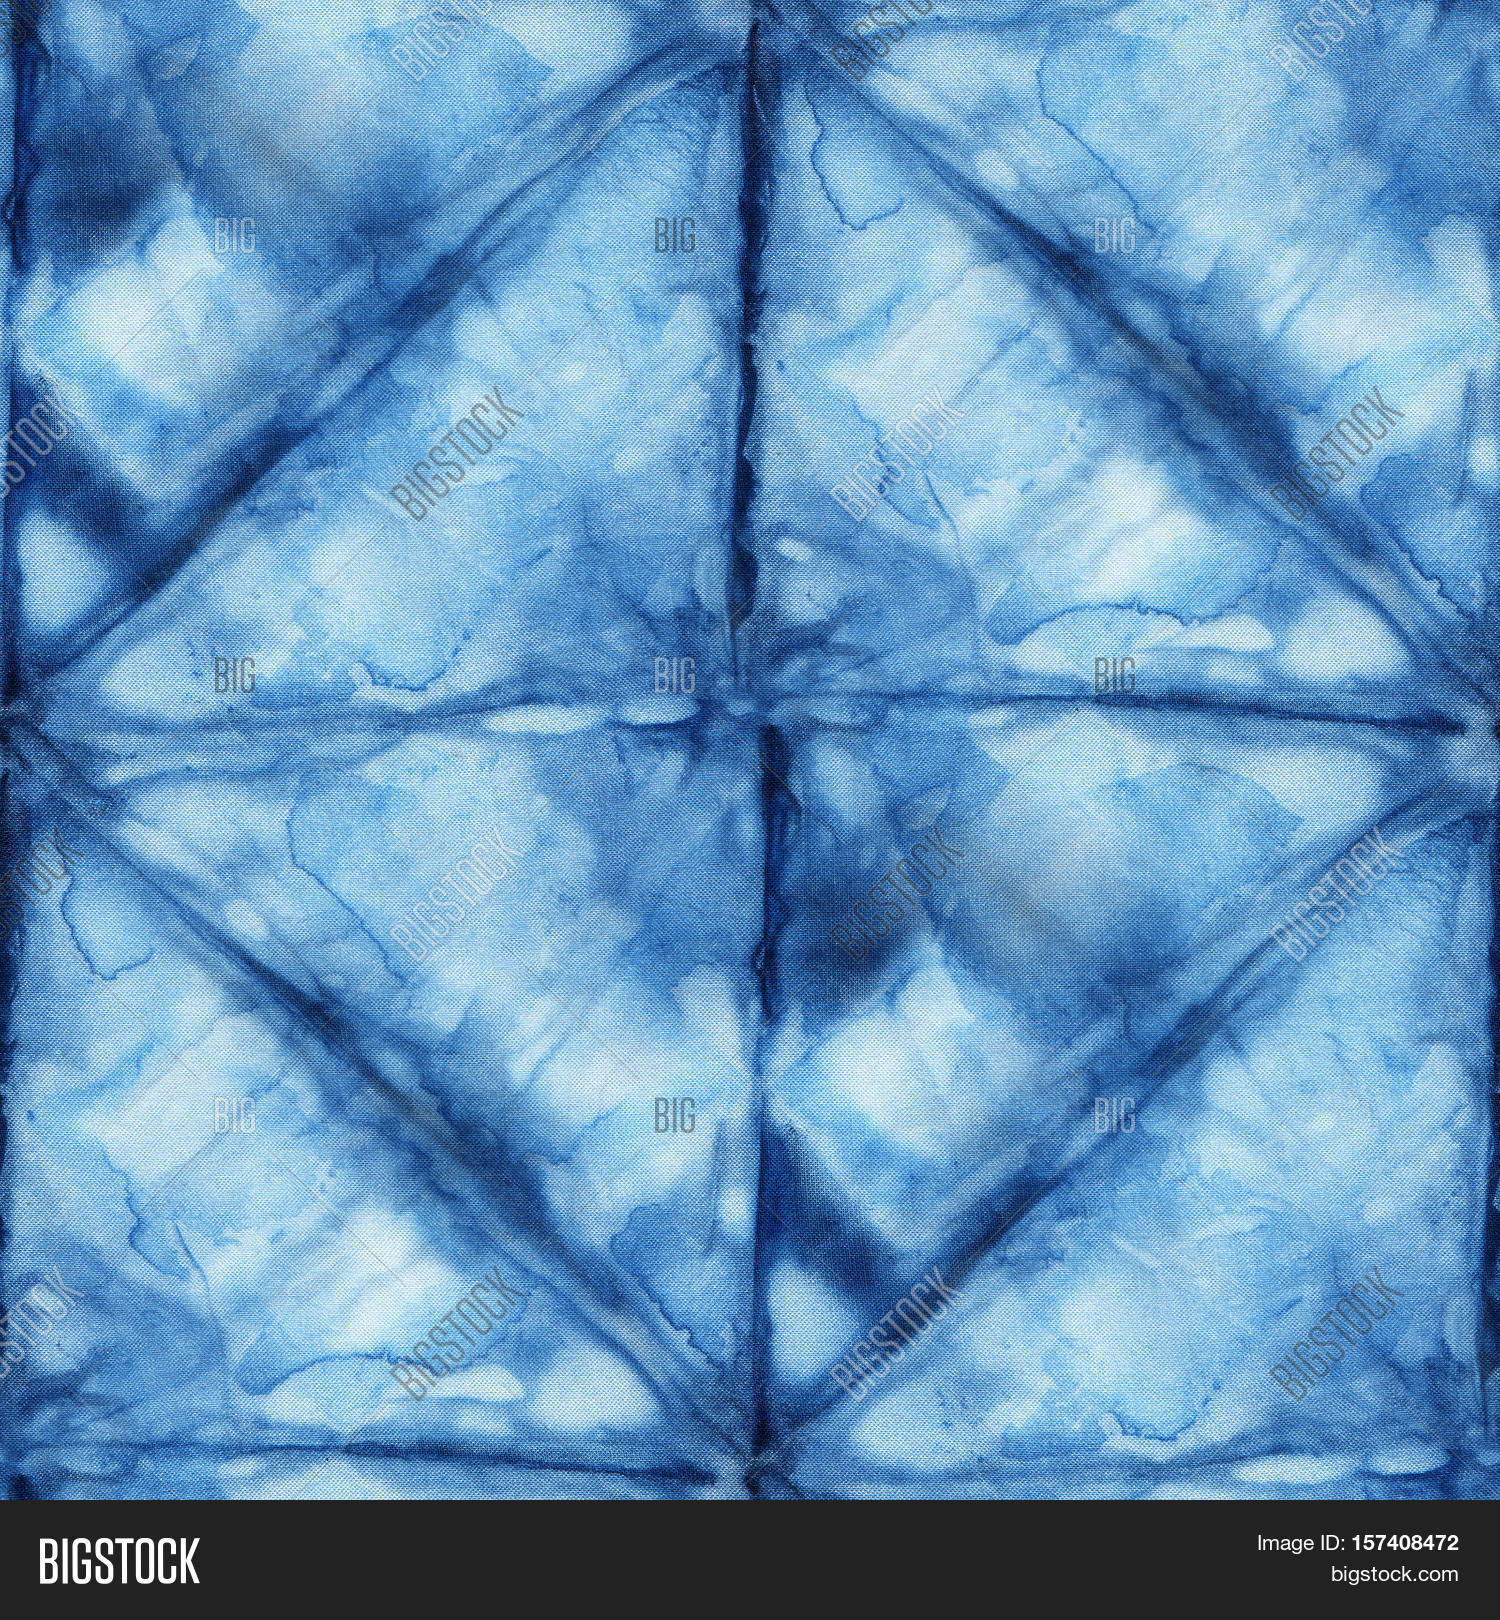 Indigo dye patterns